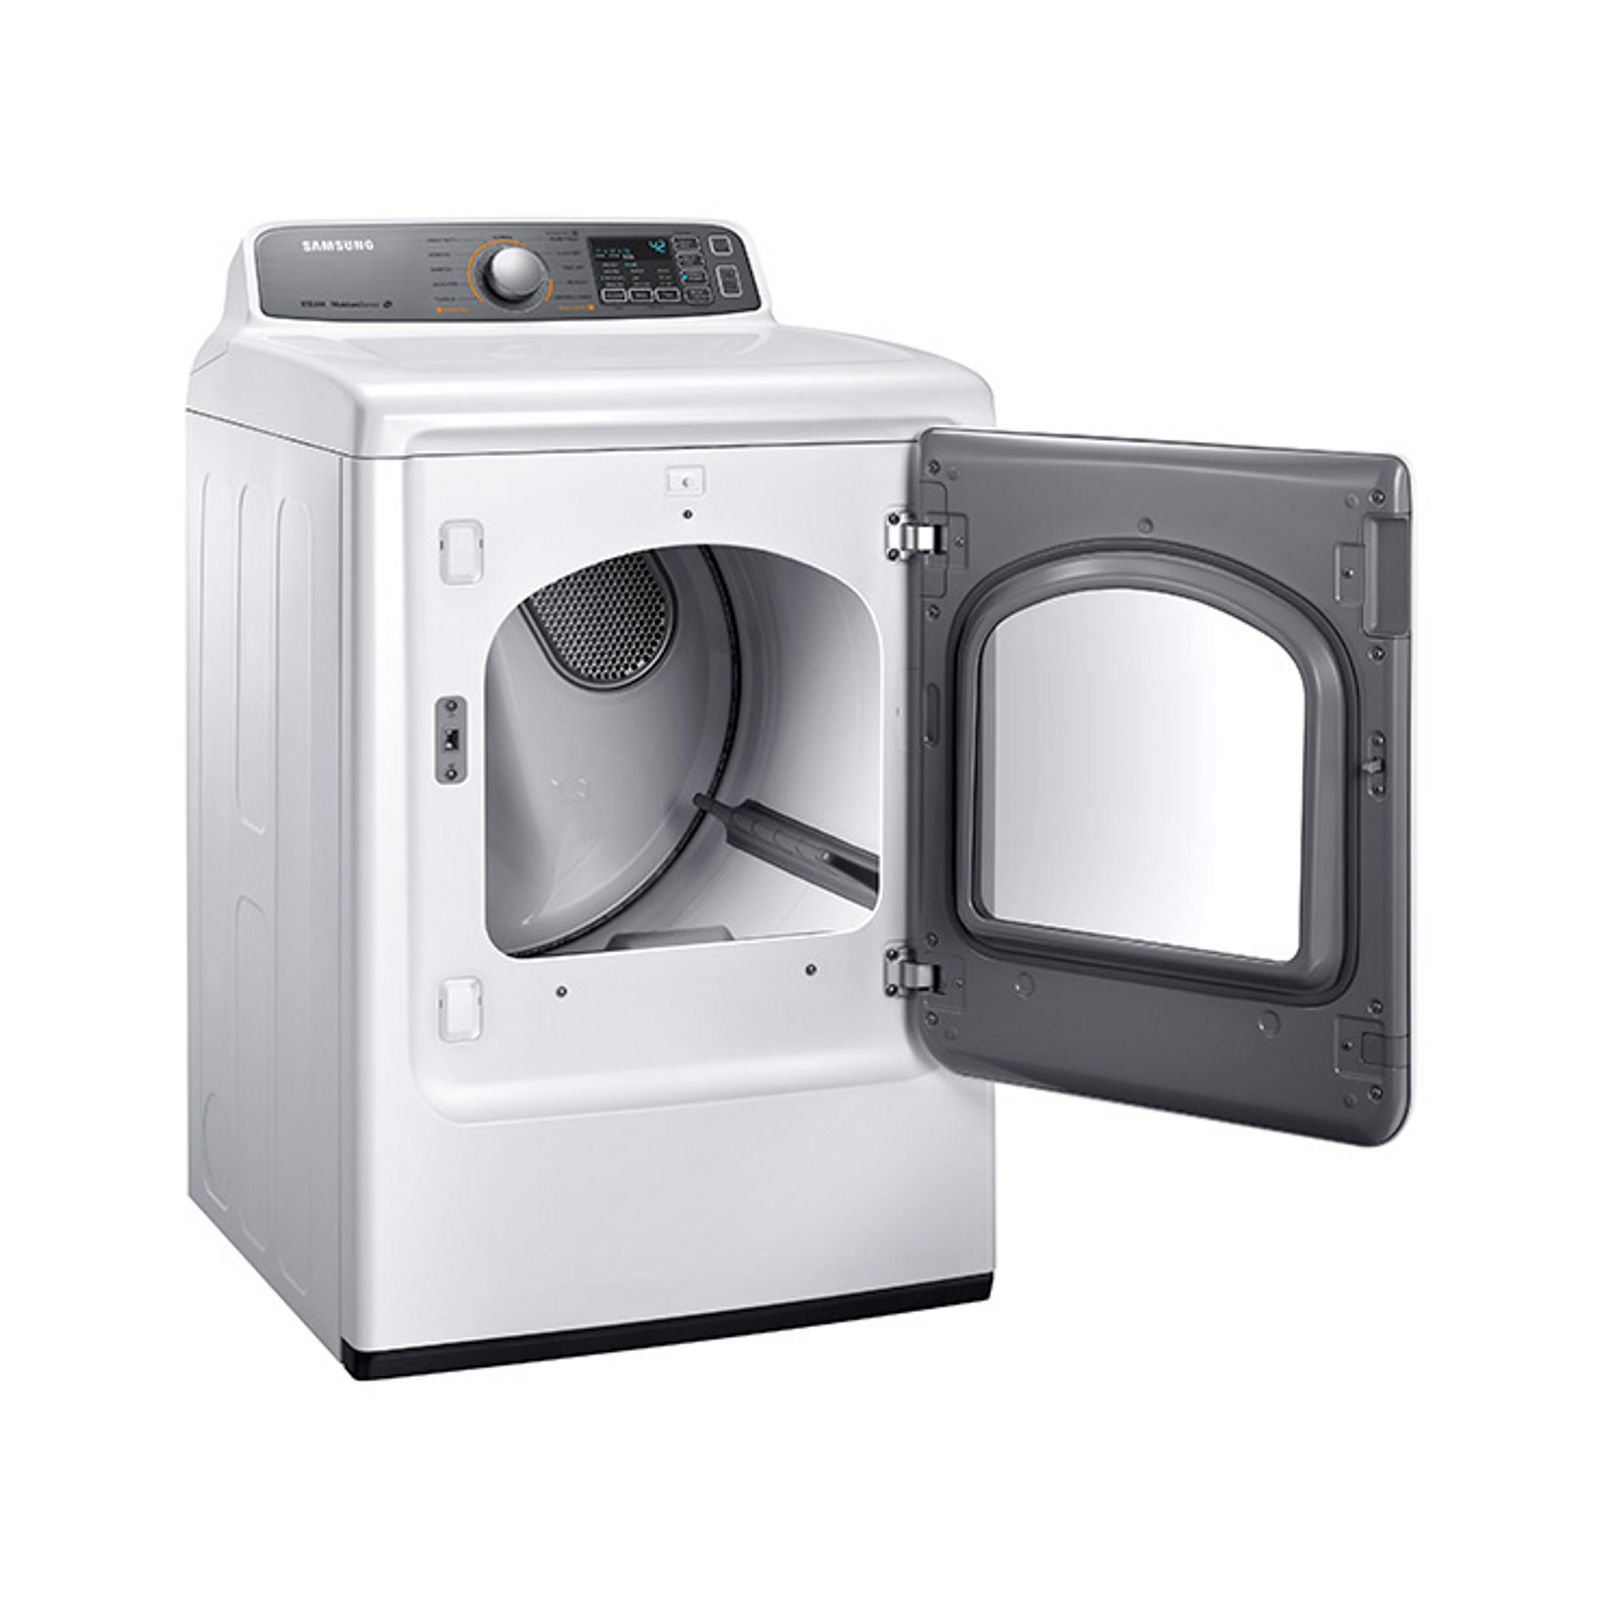 Samsung DV48H7400EW 7.4 cu. ft. Electric Dryer - White